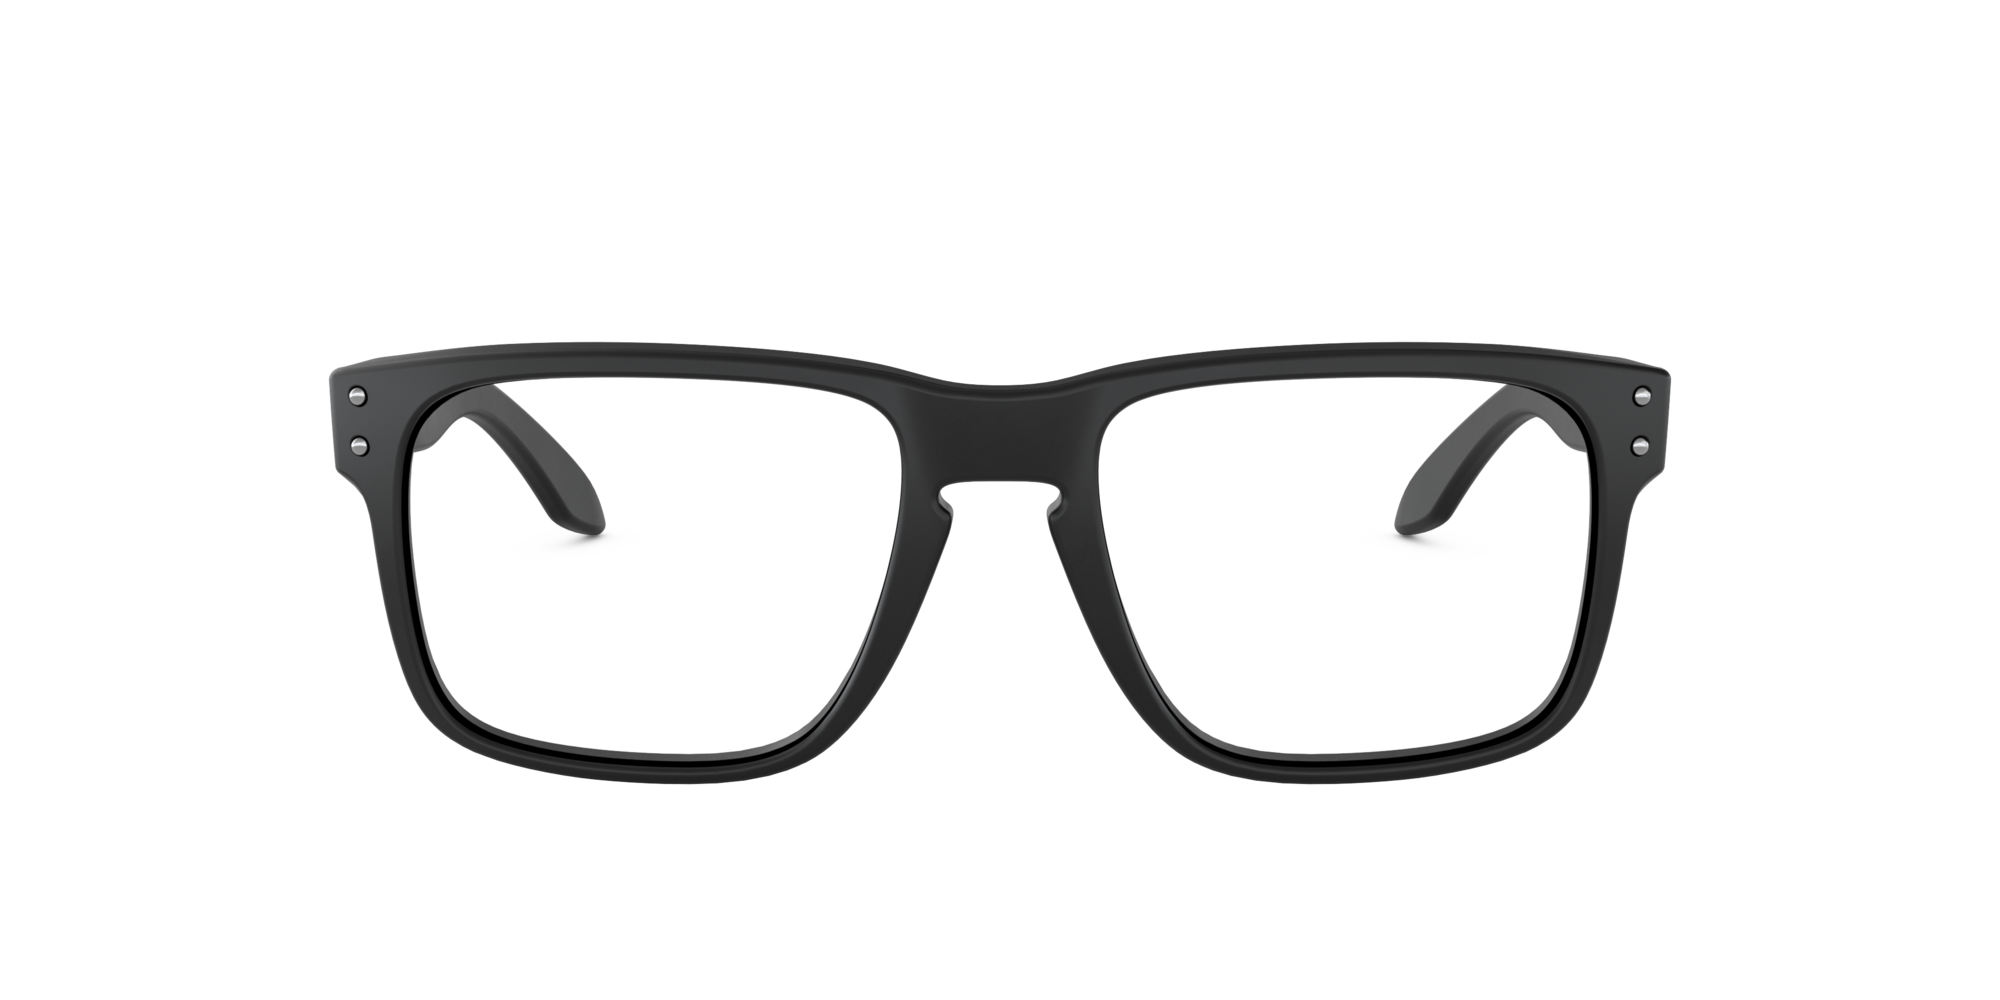 Image for OX8156 HOLBROOK RX from LensCrafters   Glasses, Prescription Glasses Online, Eyewear